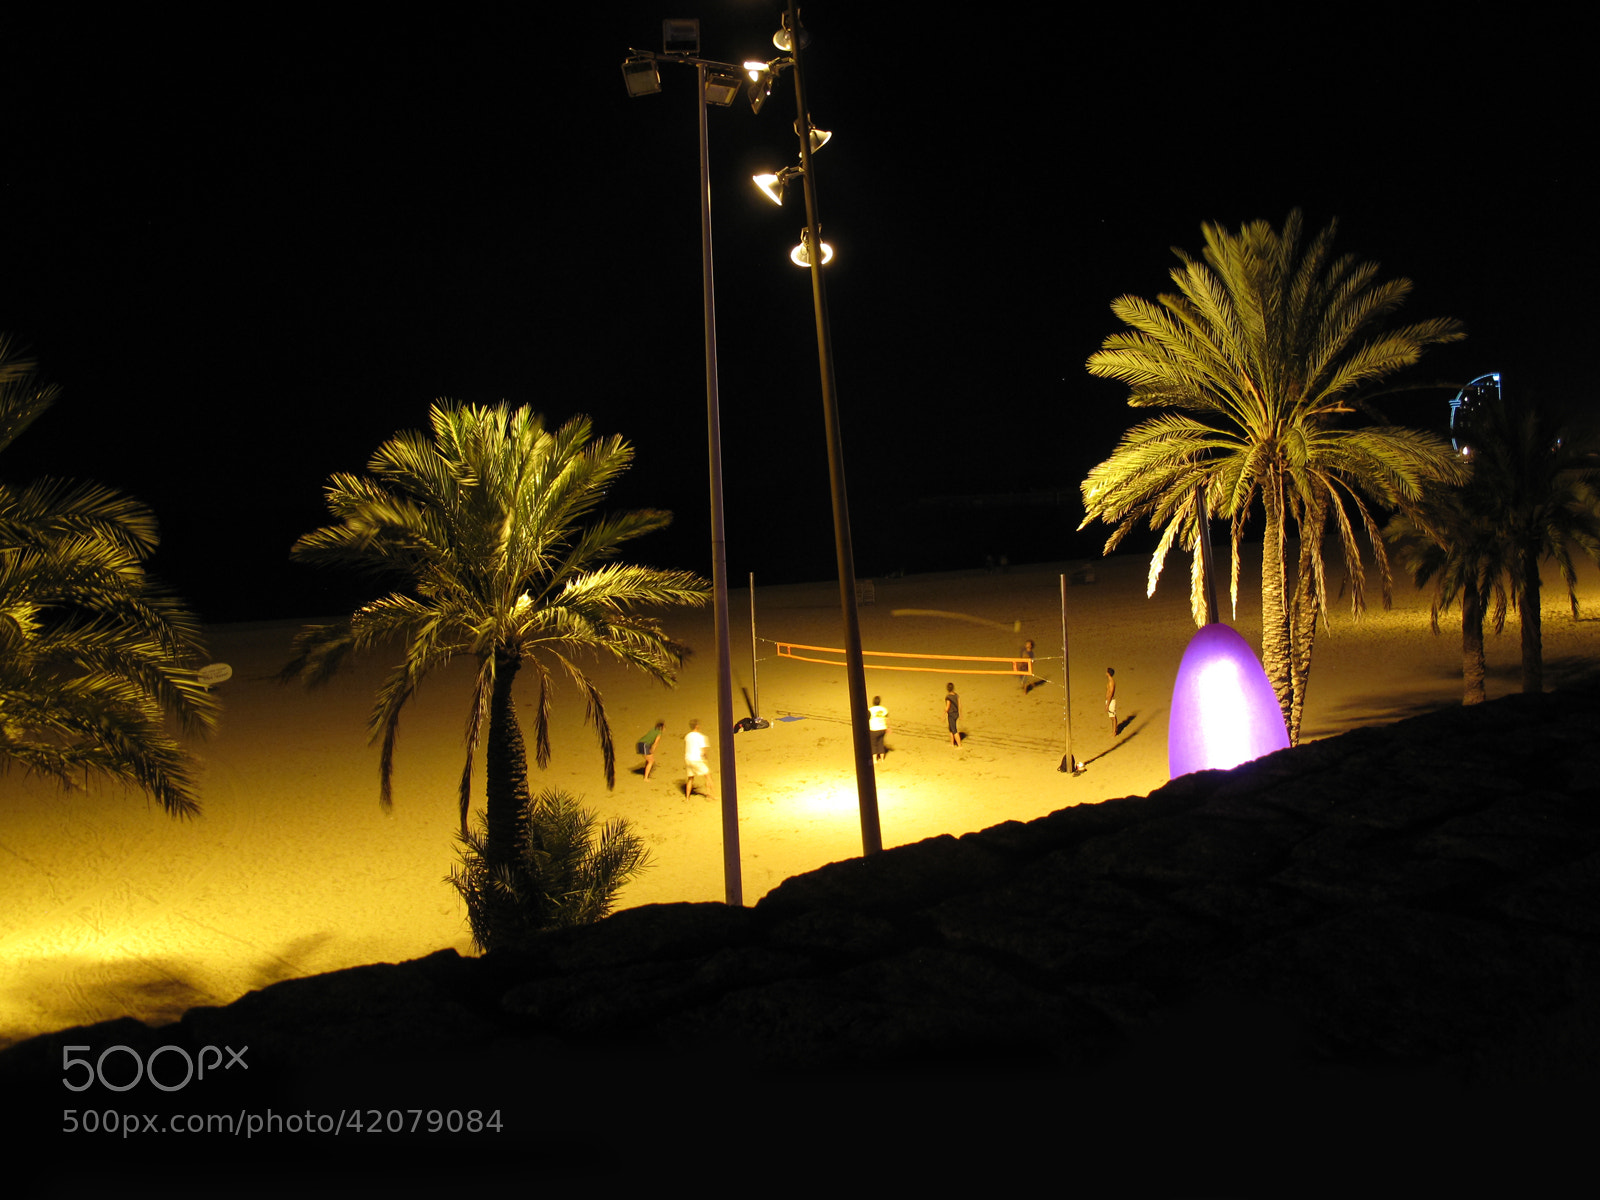 Photograph Beach Volleyball - Barceloneta by Ivanka J. Kostial on 500px